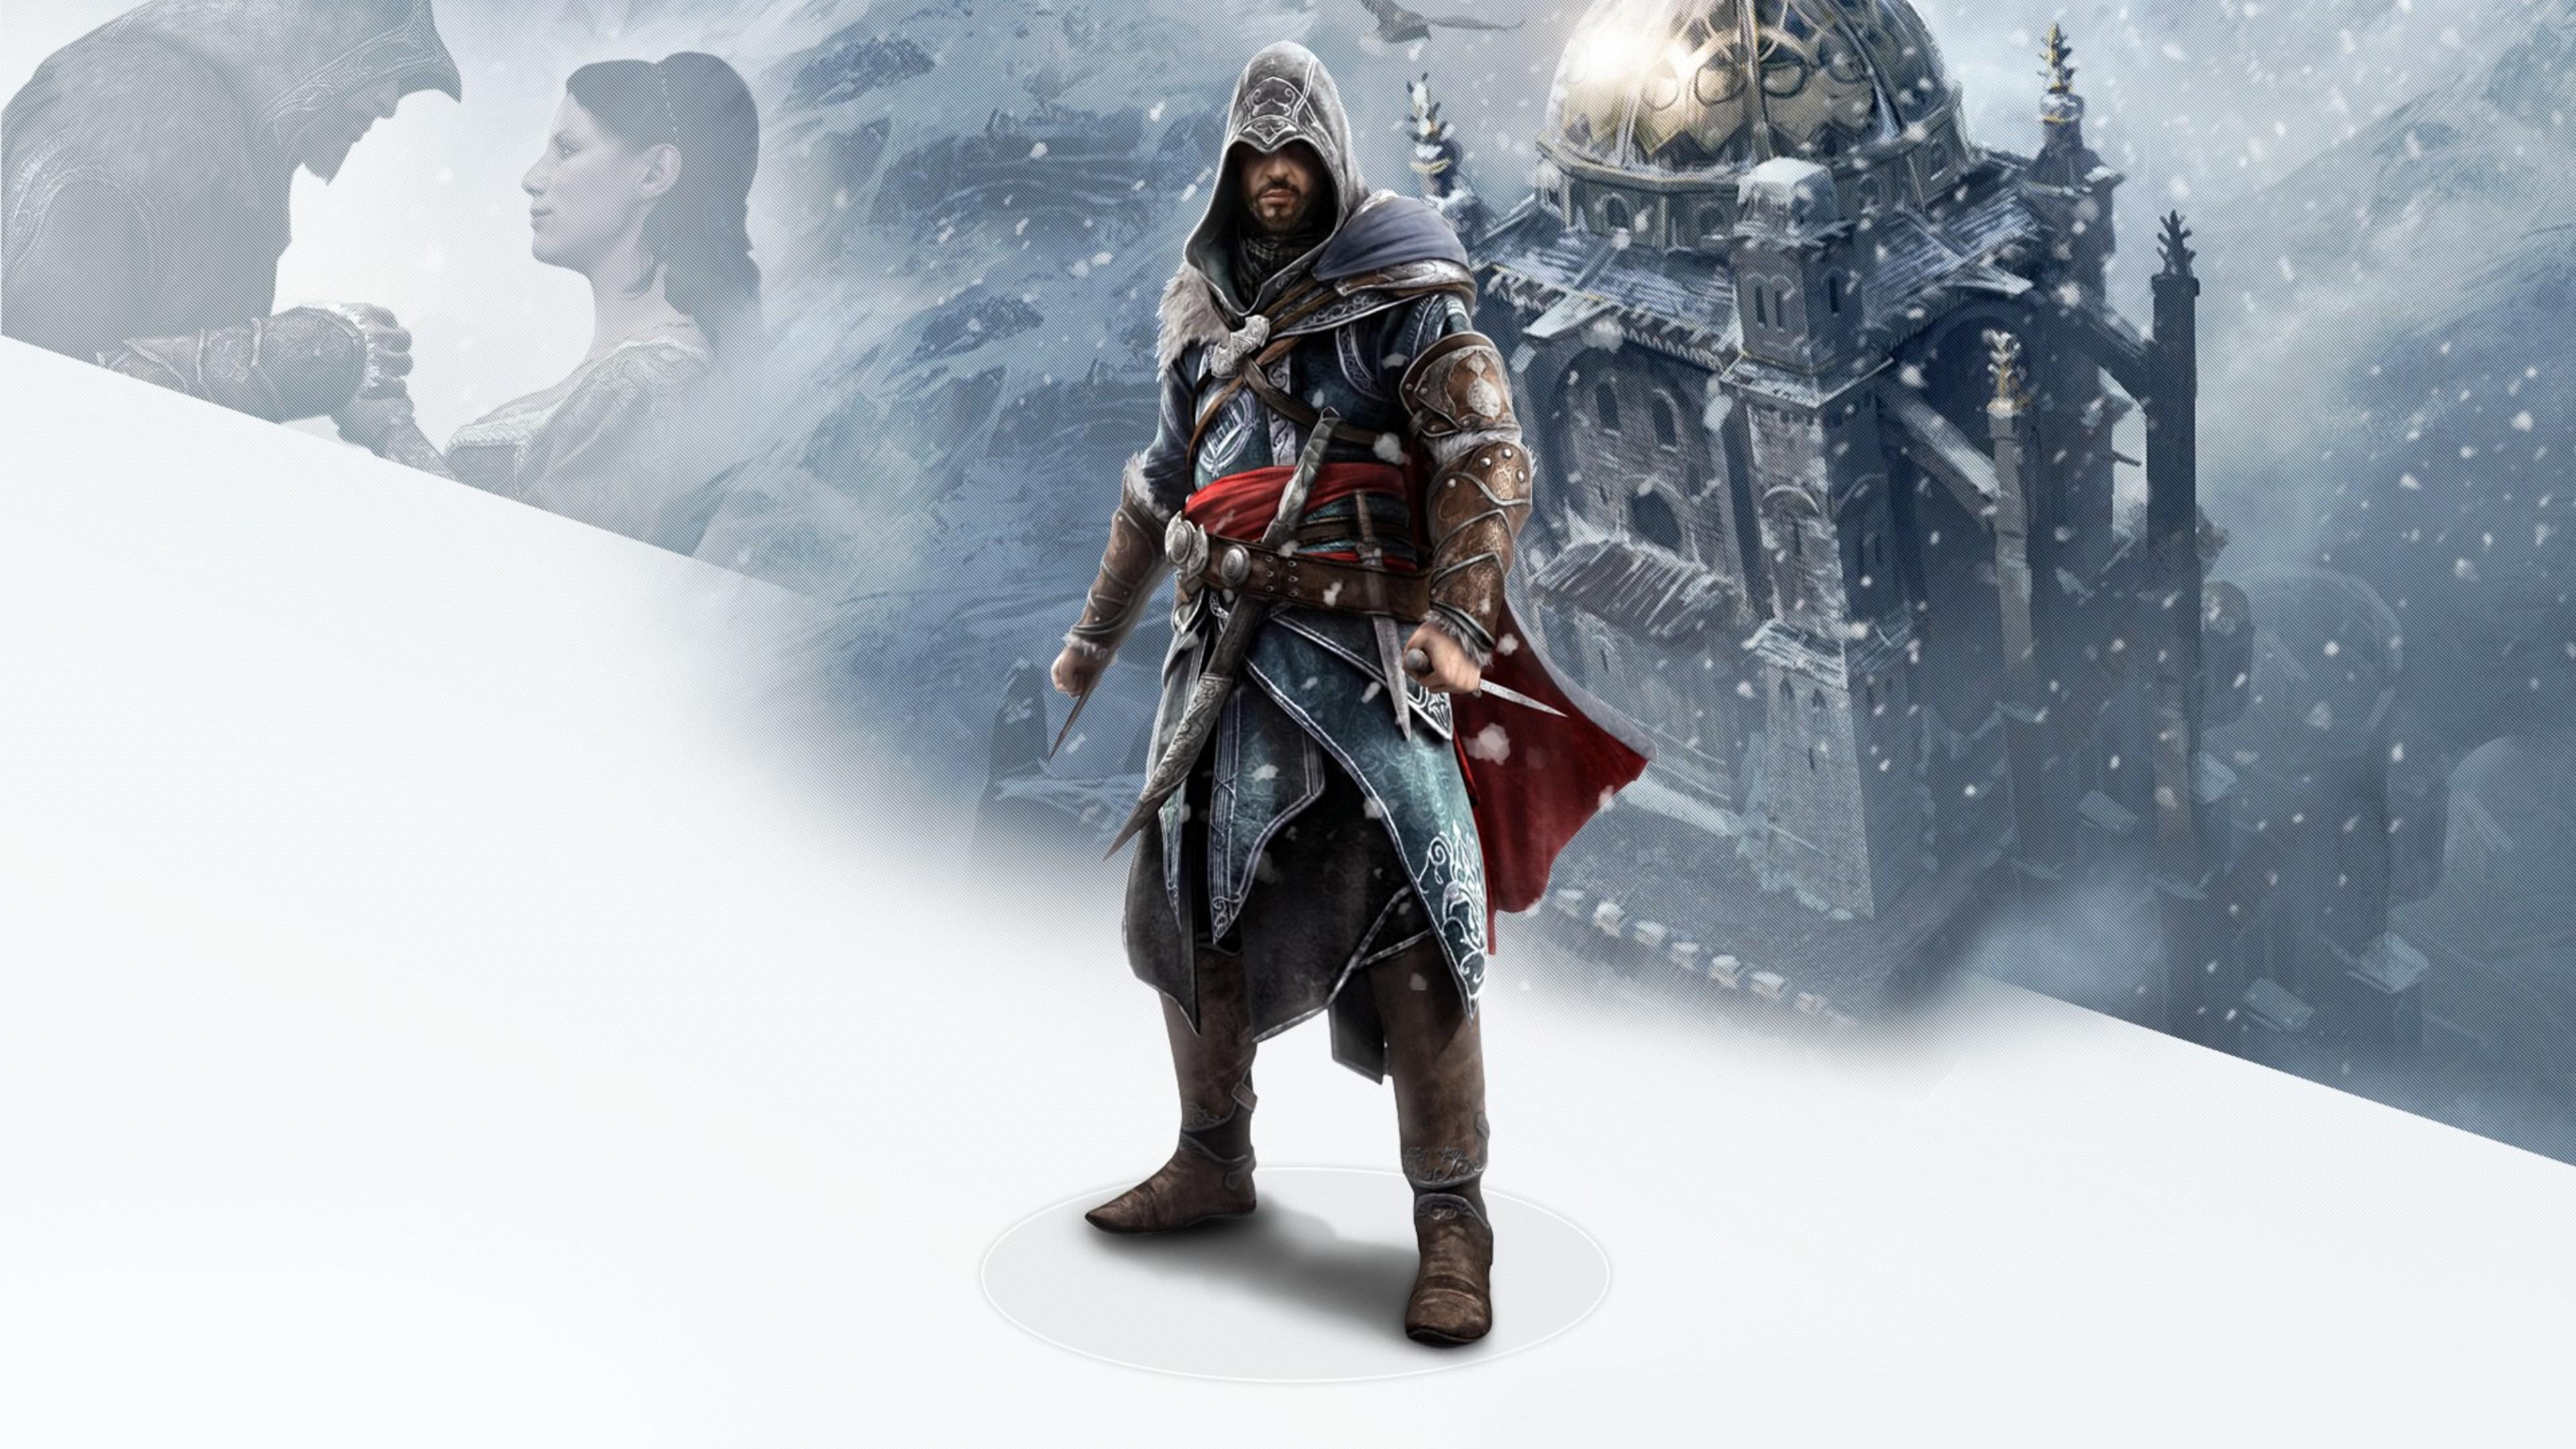 assassins creed revelations hd games 4k wallpapers